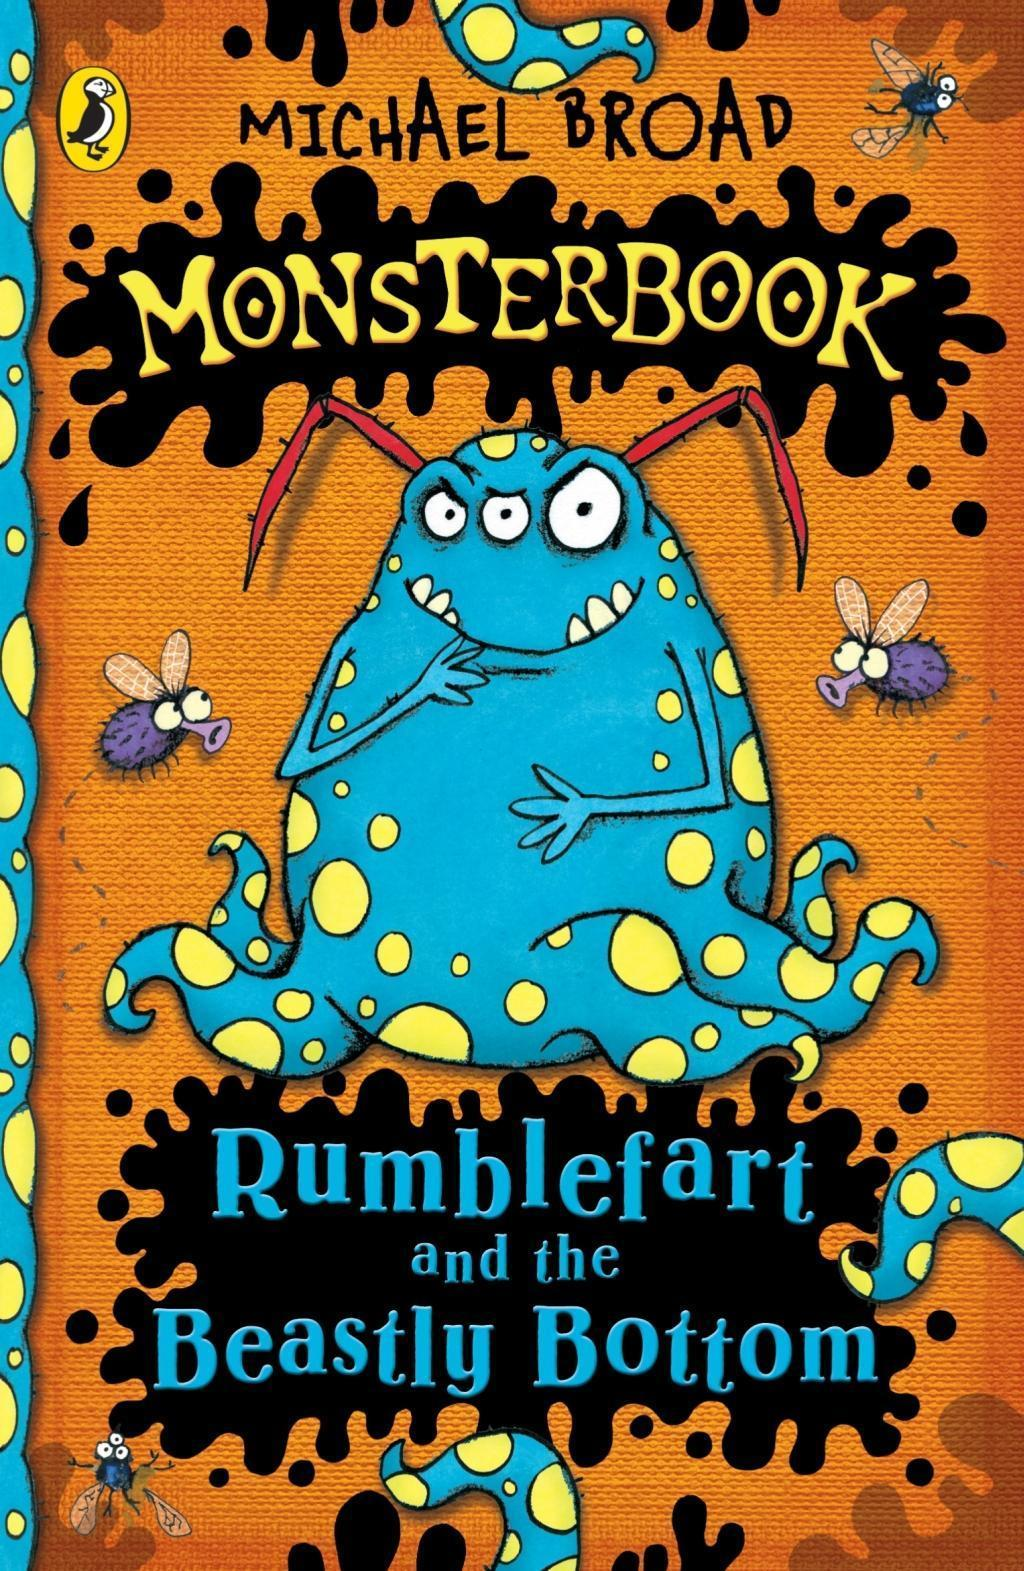 Monsterbook: Rumblefart and the Beastly Bottom